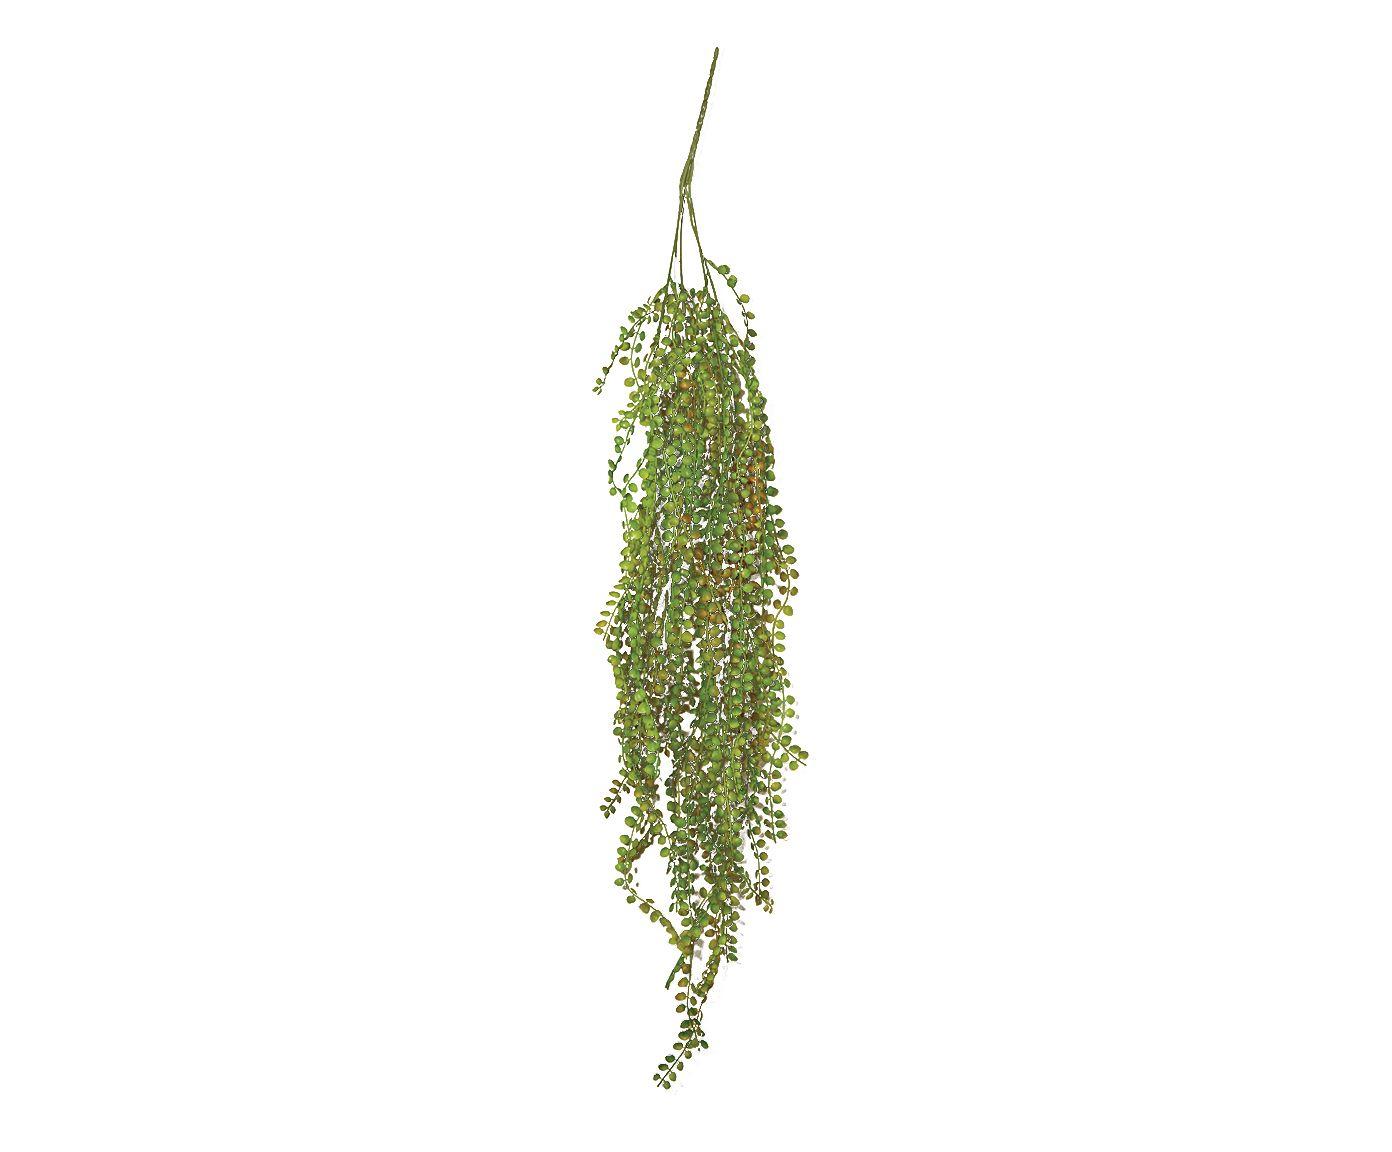 Planta Permanente Rookwood - 97cm | Westwing.com.br